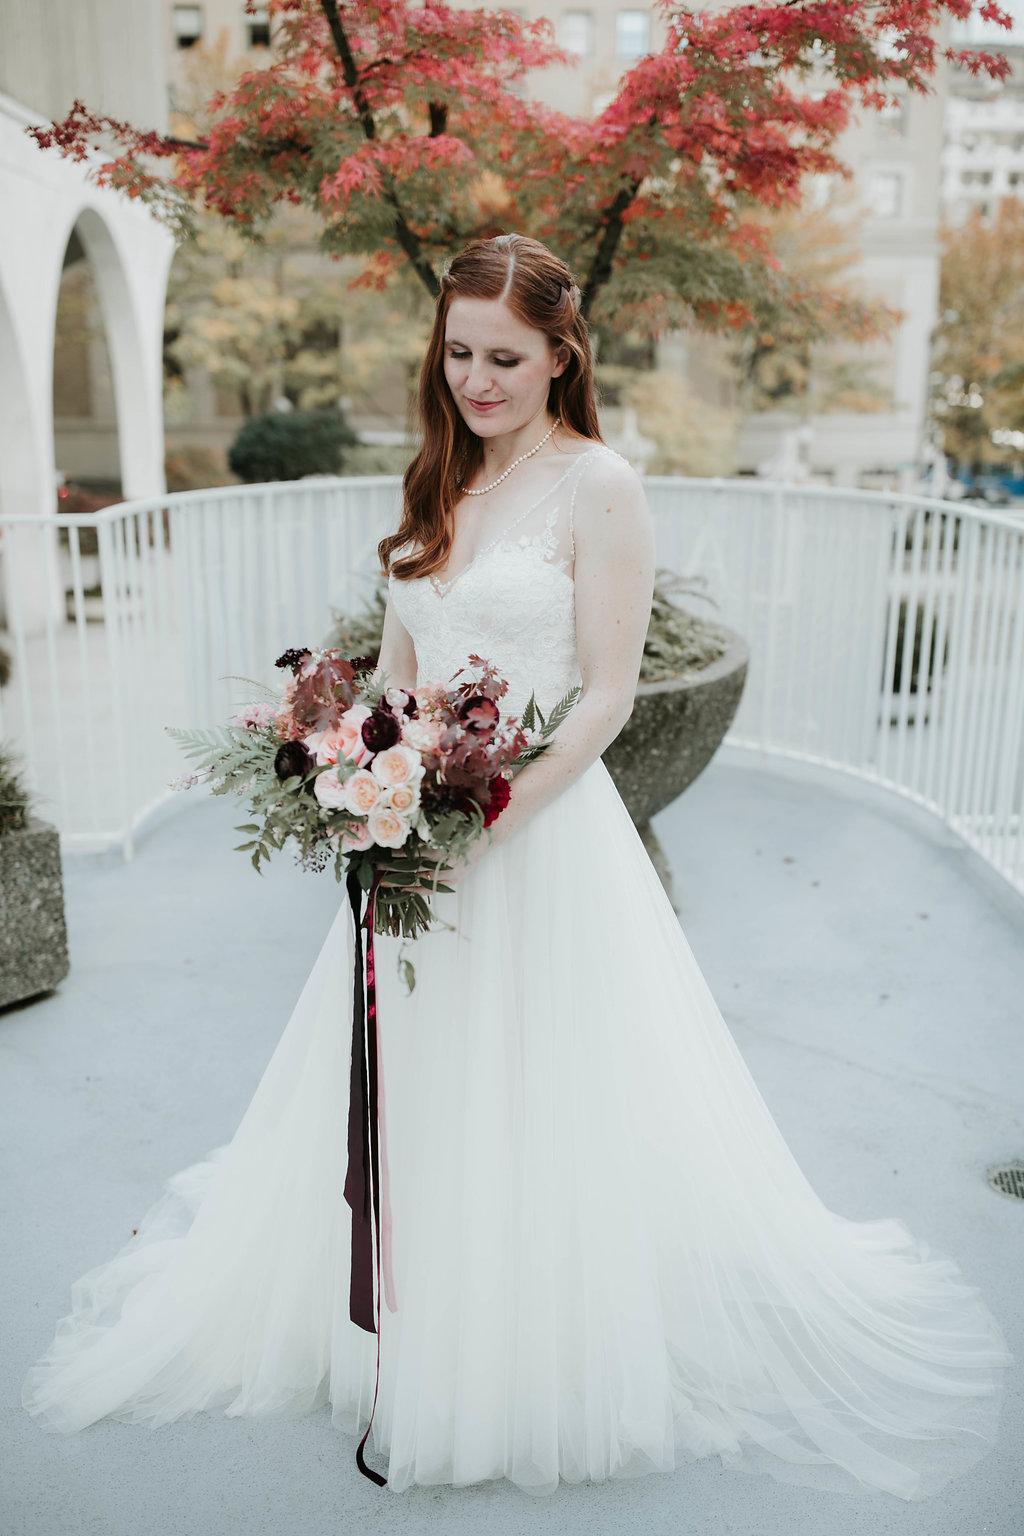 Lily+Jonathan_Fairmont_Olympic_hotel_wedding_Seattle_wedding_photographer_256.JPG